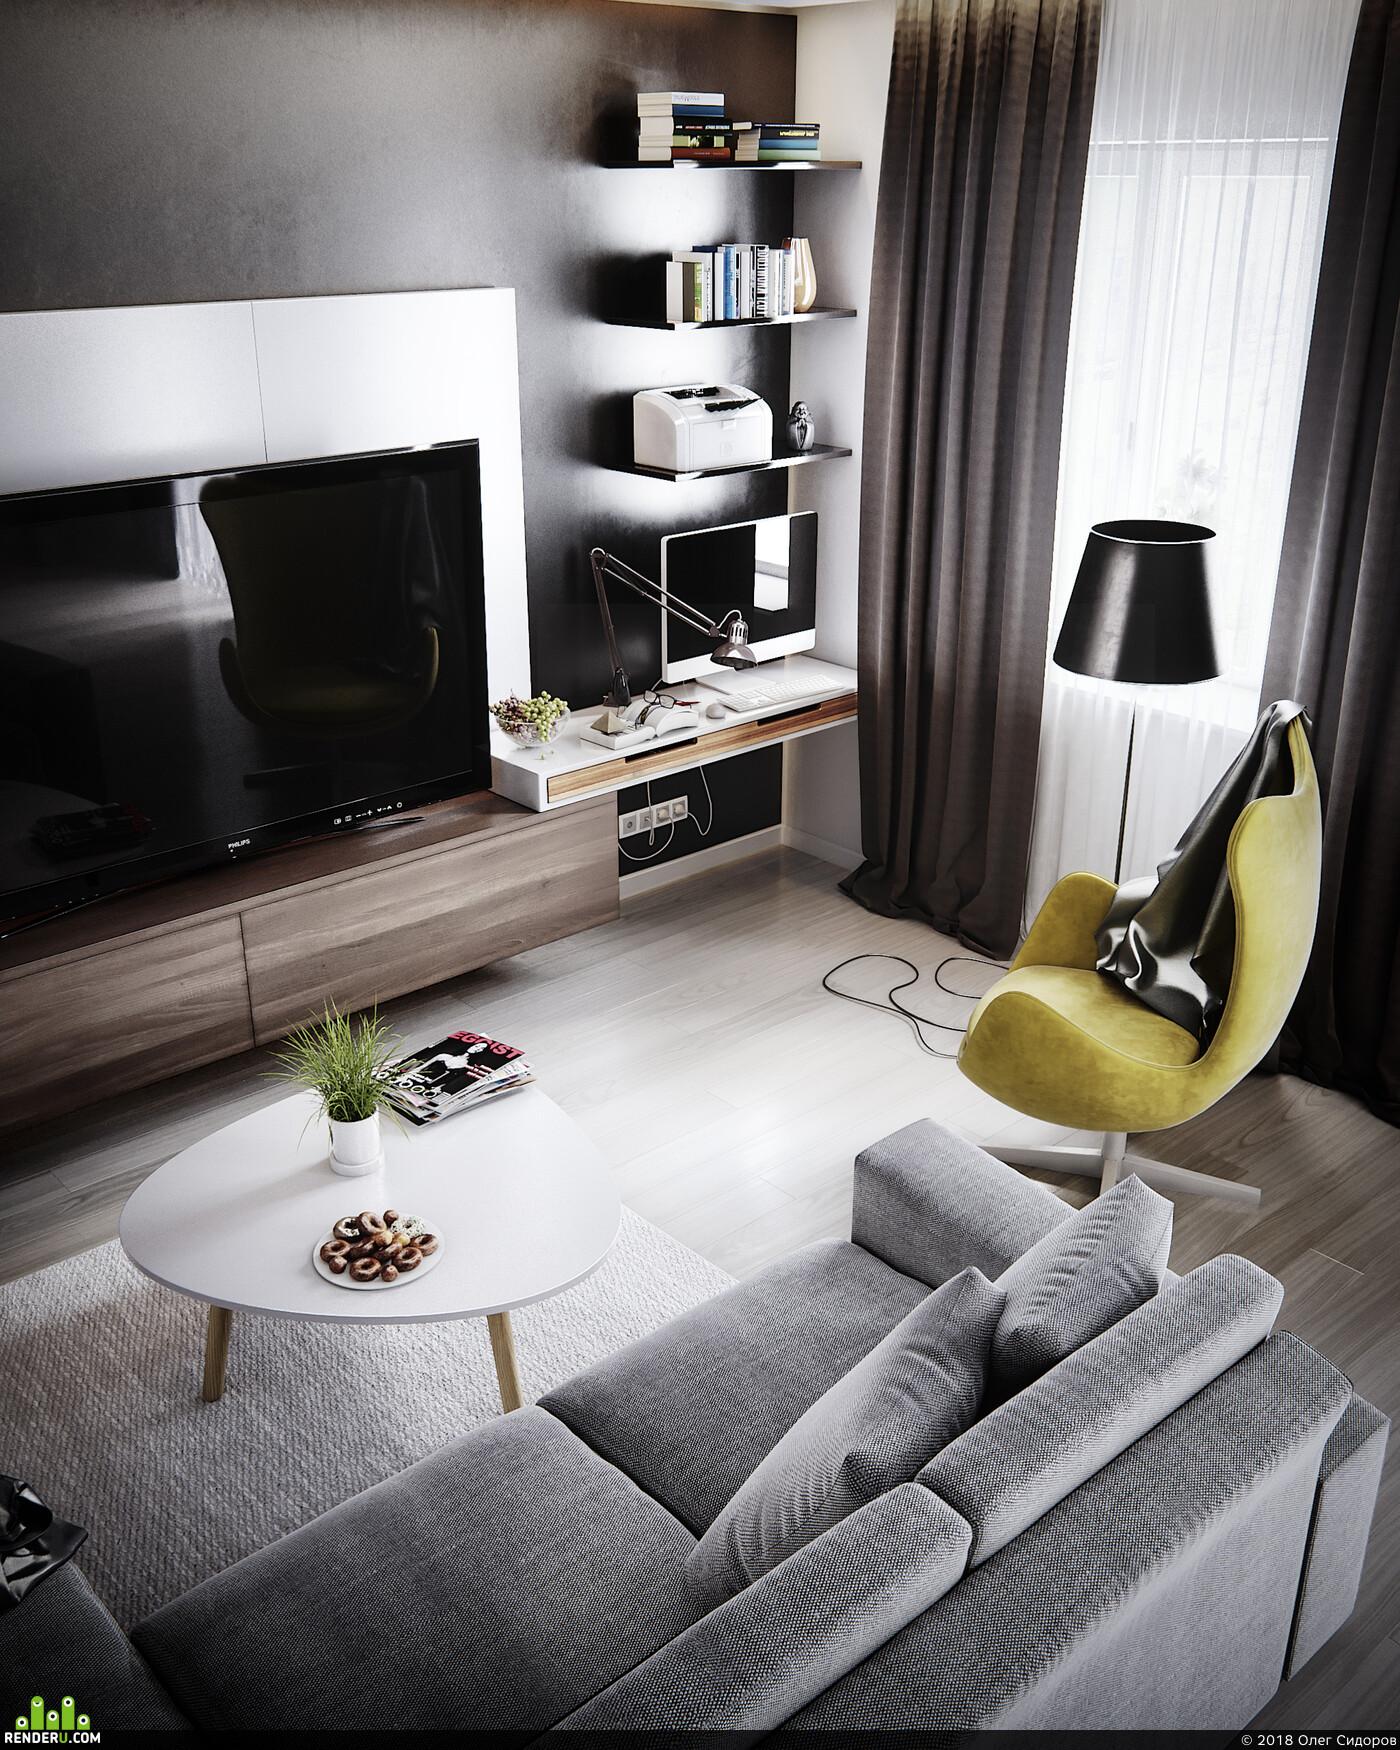 coronarenderer, 3Dsmax, Photoshop, home